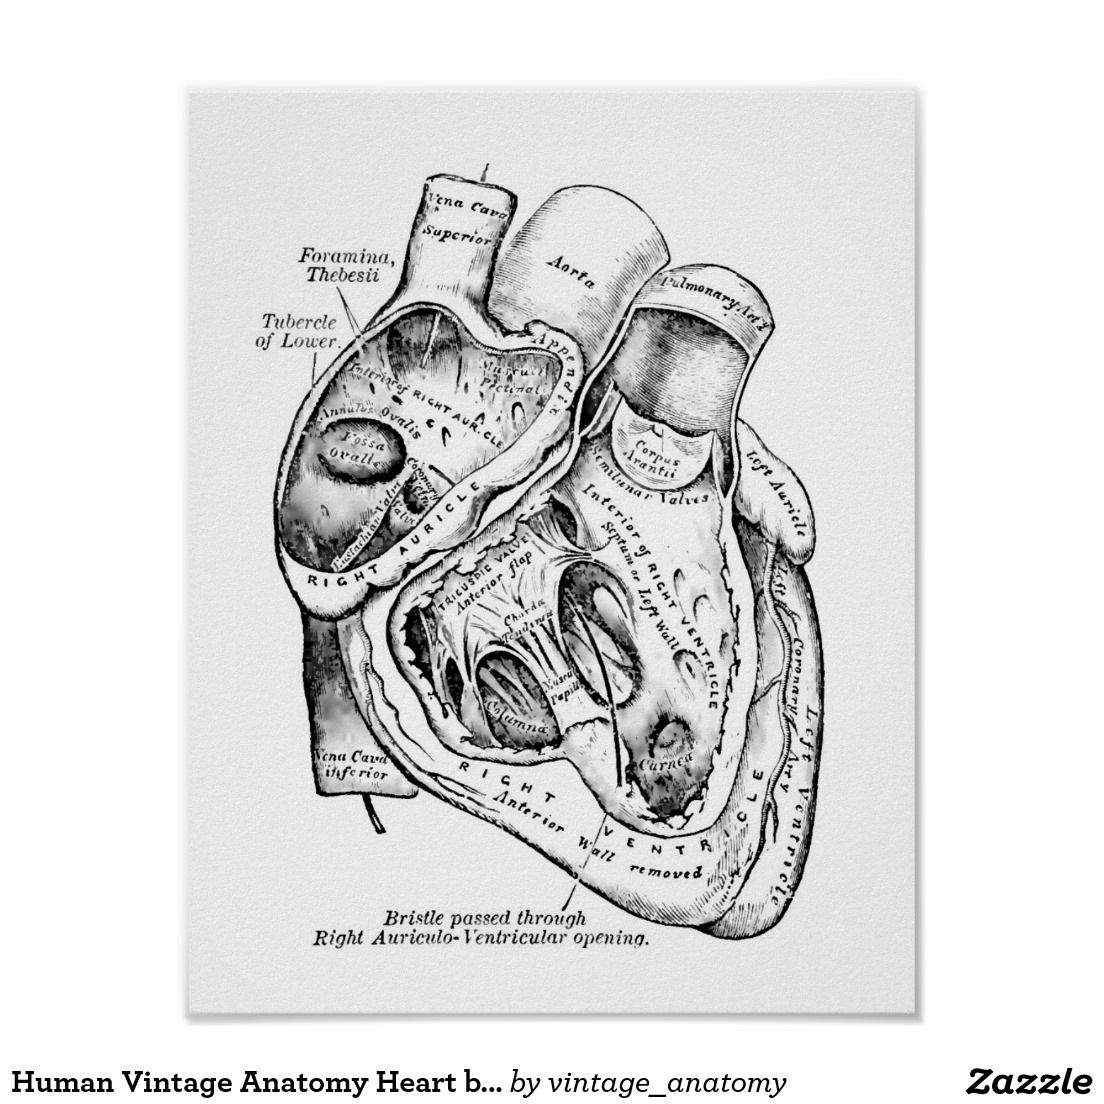 human vintage anatomy heart black and white poster   vintage anatomy